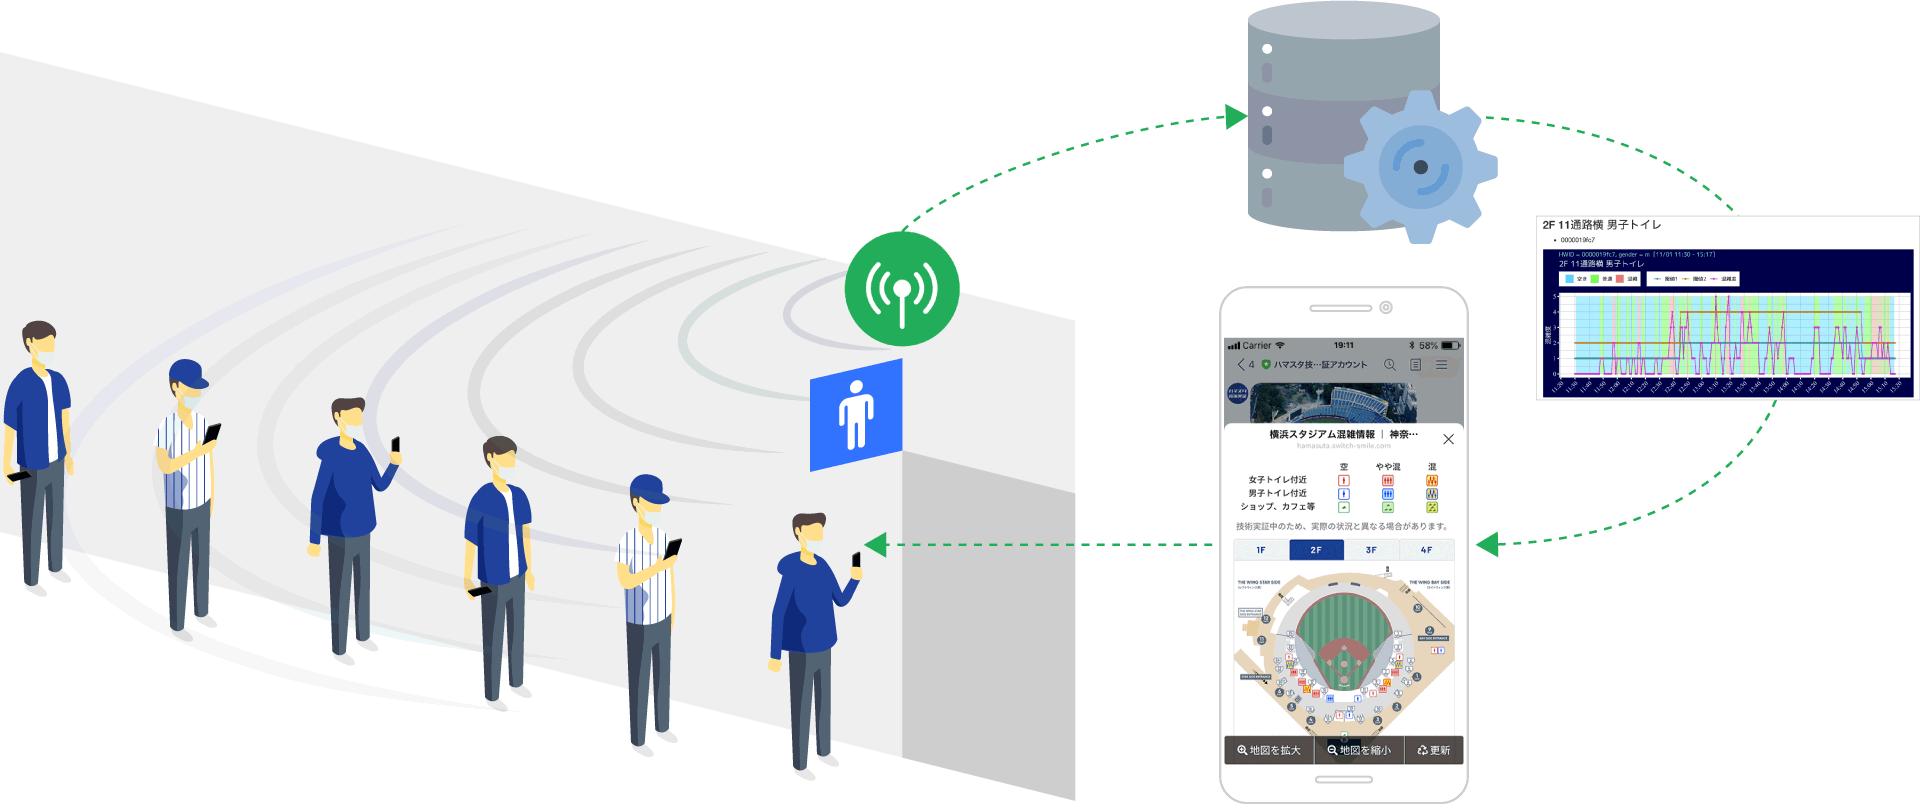 LINE Beaconを活用したトイレ等の混雑度計測および可視化システムを構築